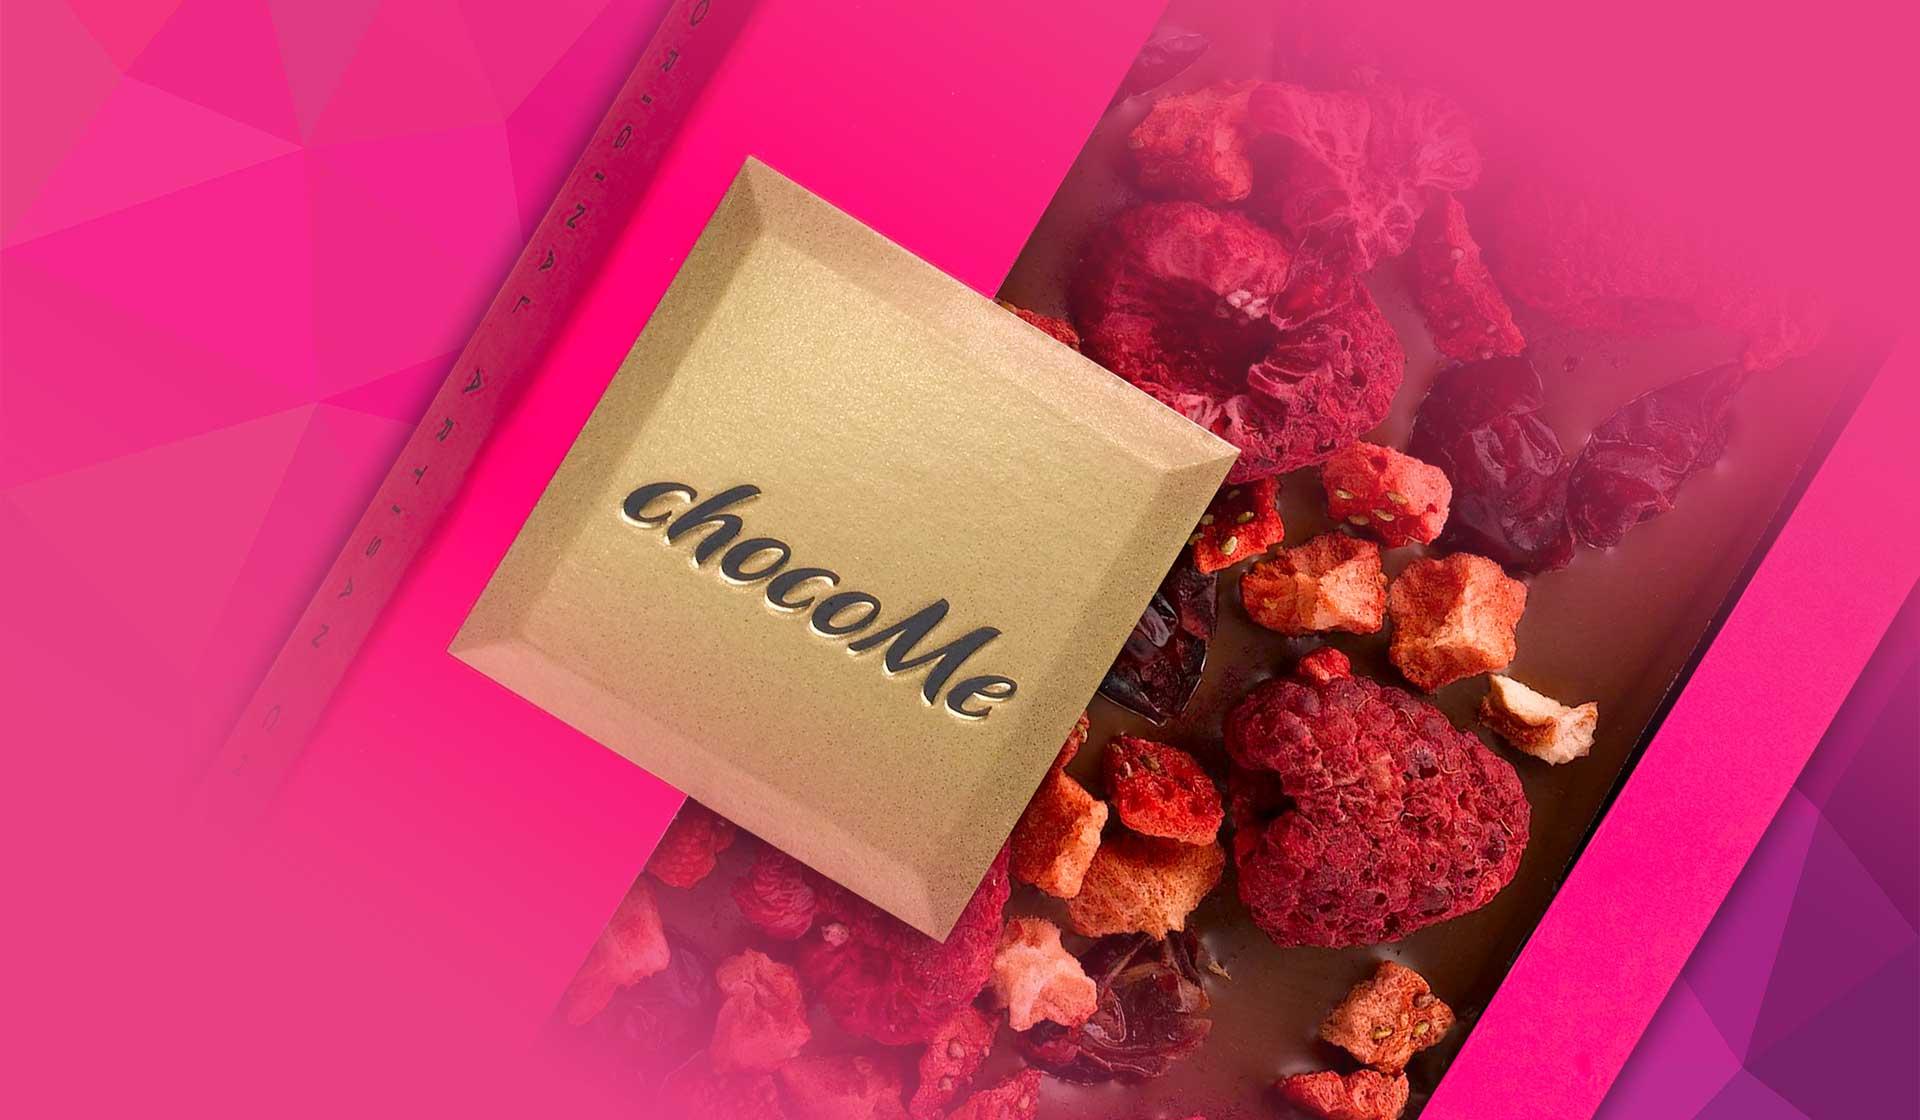 ChocoMe-Love-2-optimized-v2